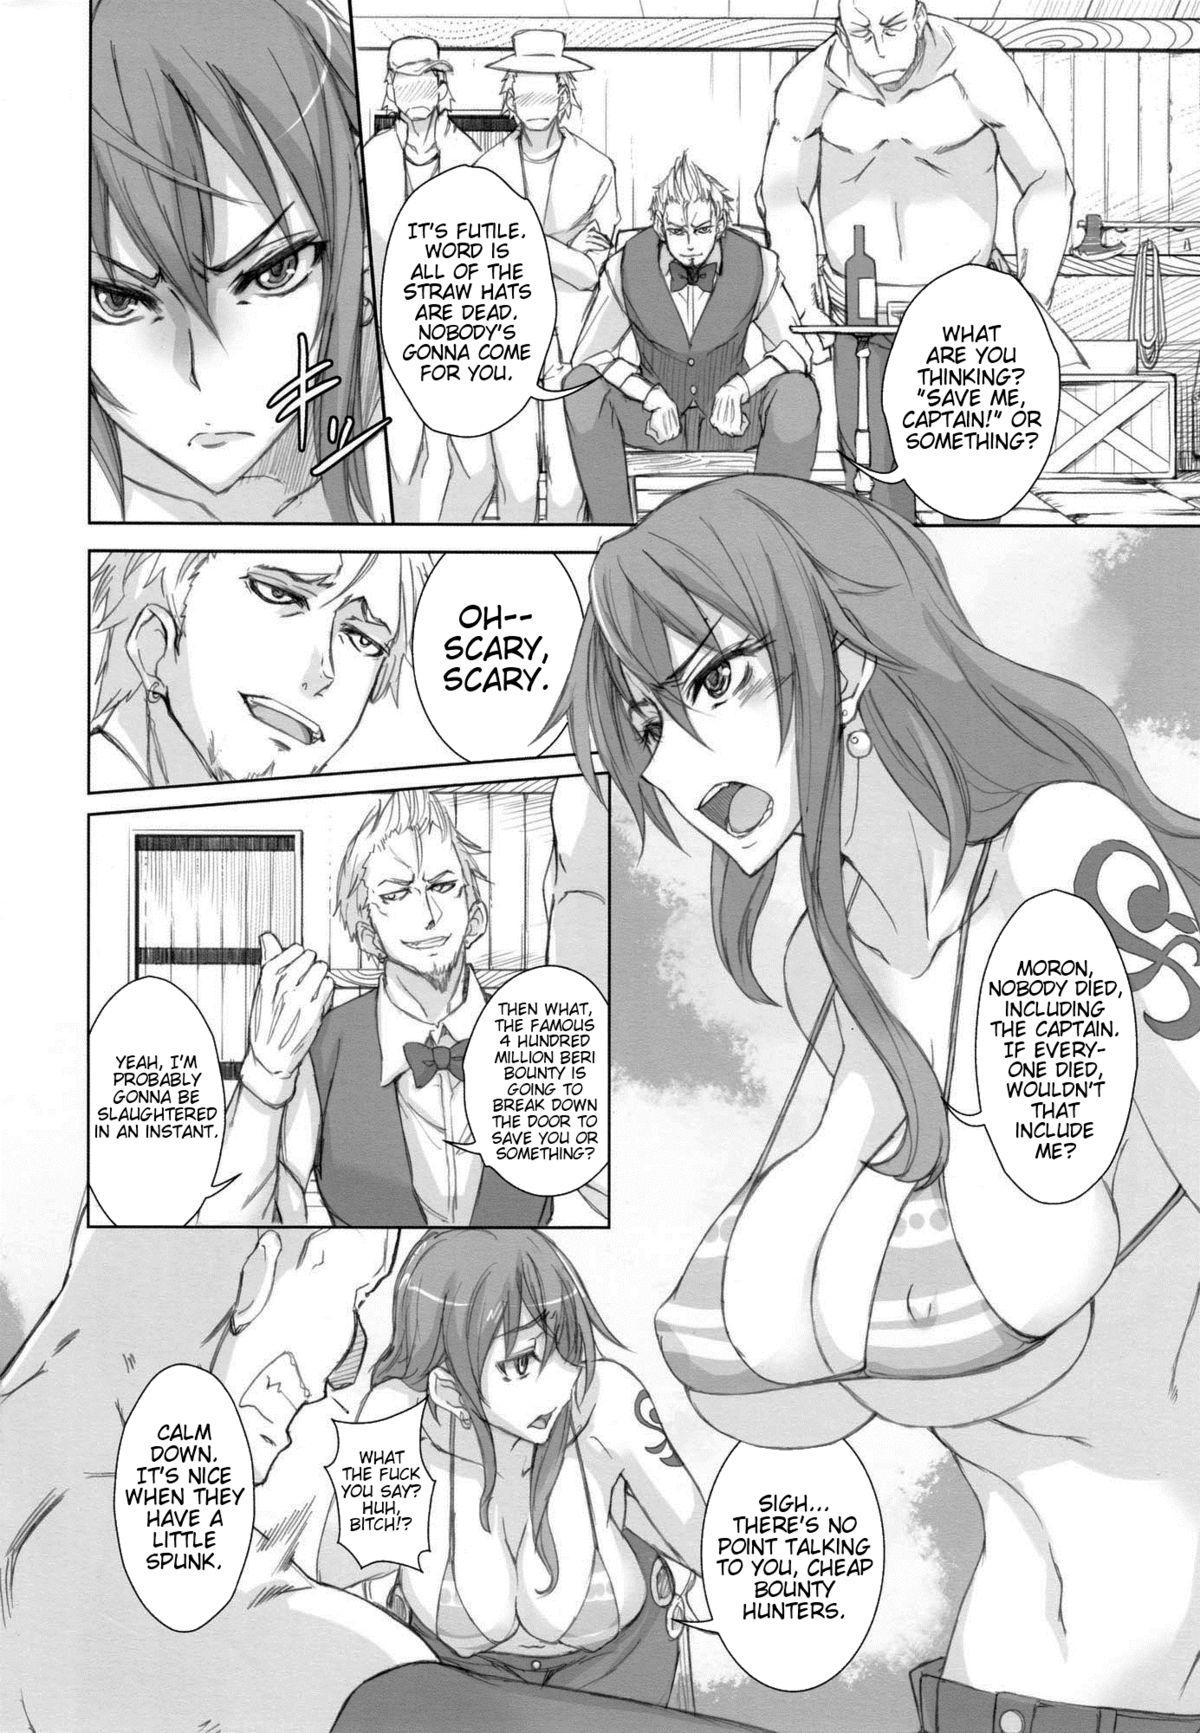 (C82) [Majimeya (isao)] GrandLine Chronicle 2 Rainyuu | GrandLine Chronicle 2 - Thunder-Tits (One Piece) [English] {doujin-moe.us} 2